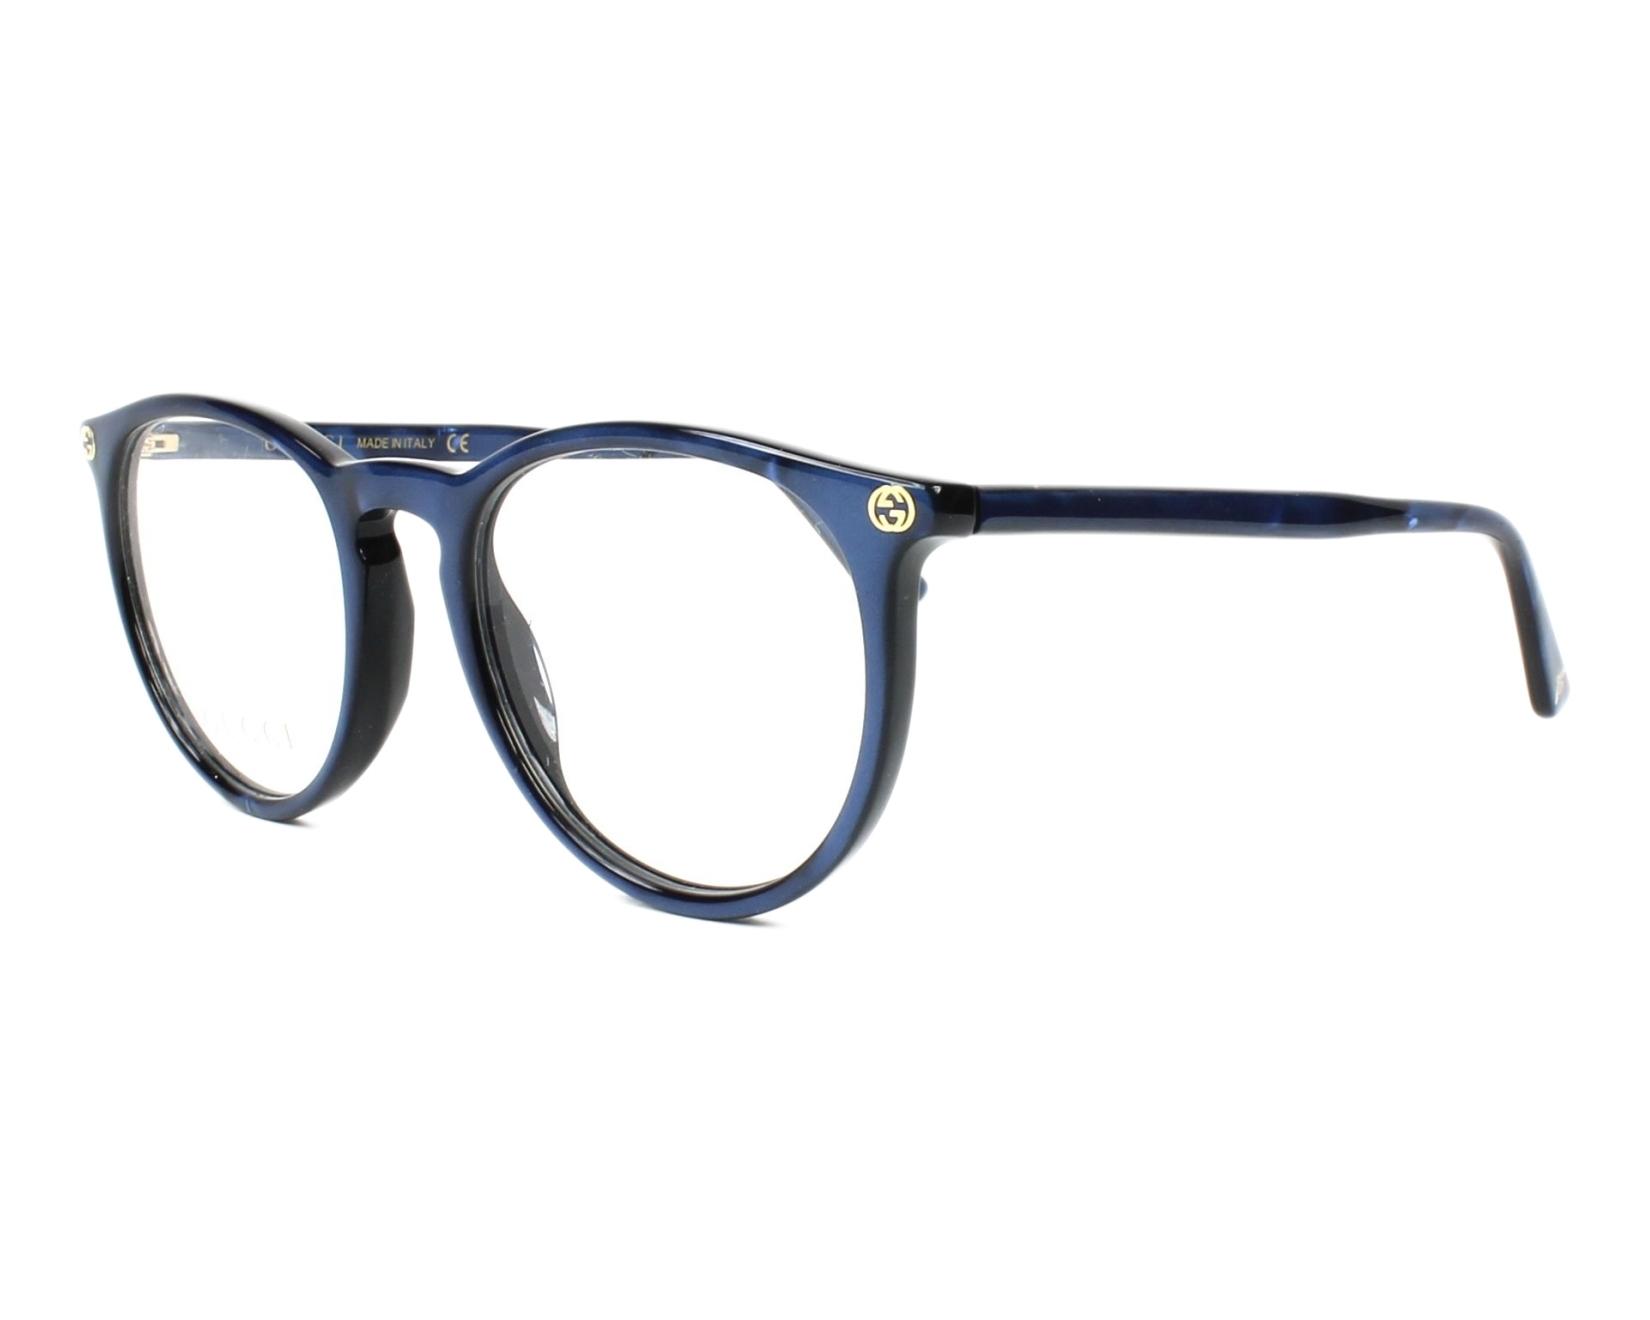 Gucci Eyeglasses Blue GG-00270 005 - Visionet US